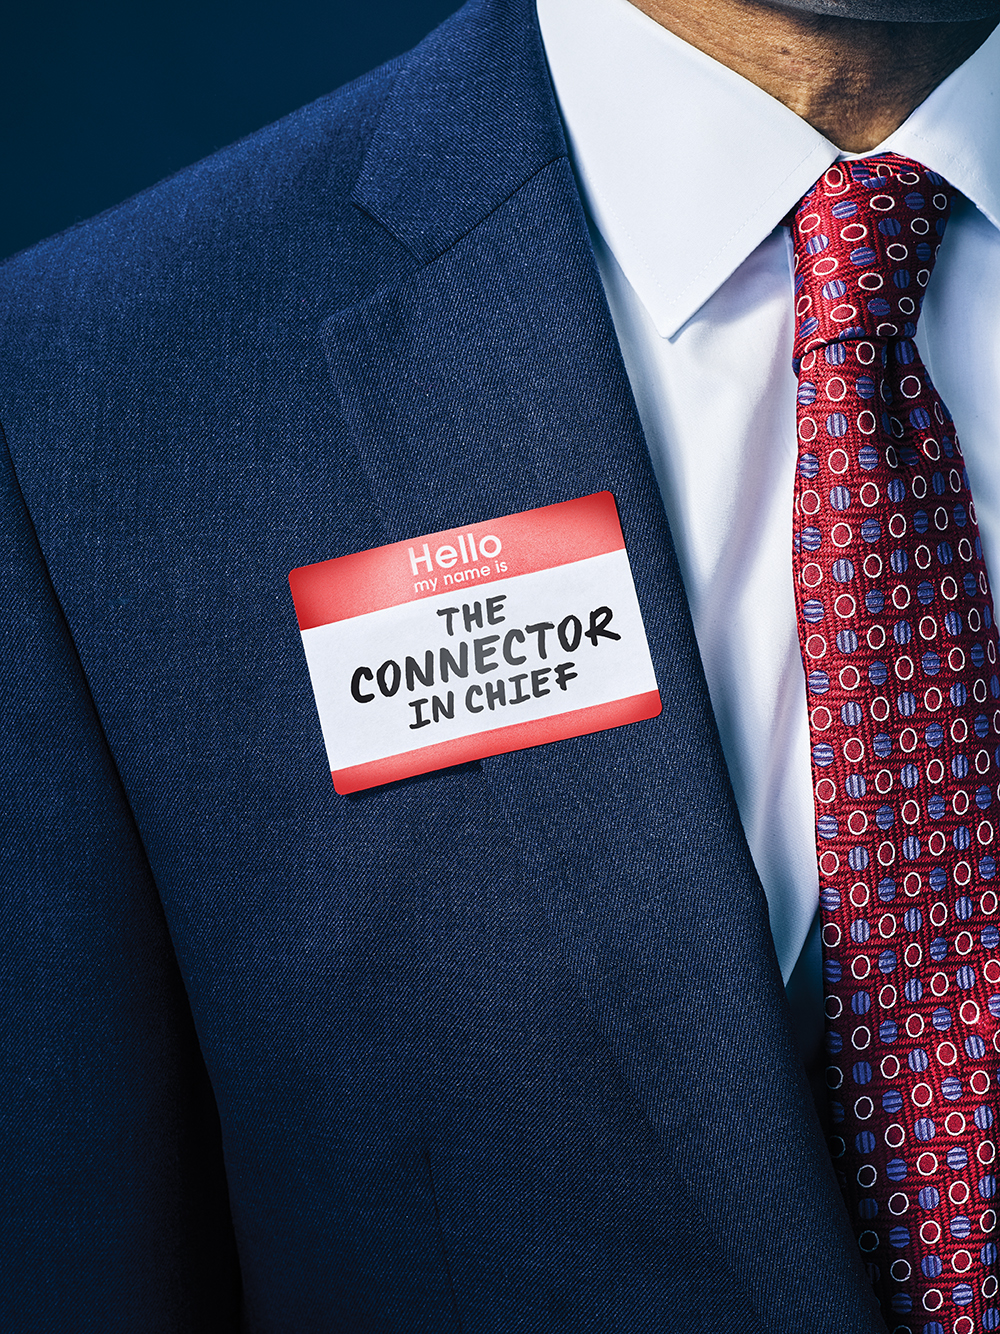 Eric Kearney Is Cincinnati's Connector in Chief - Cincinnati